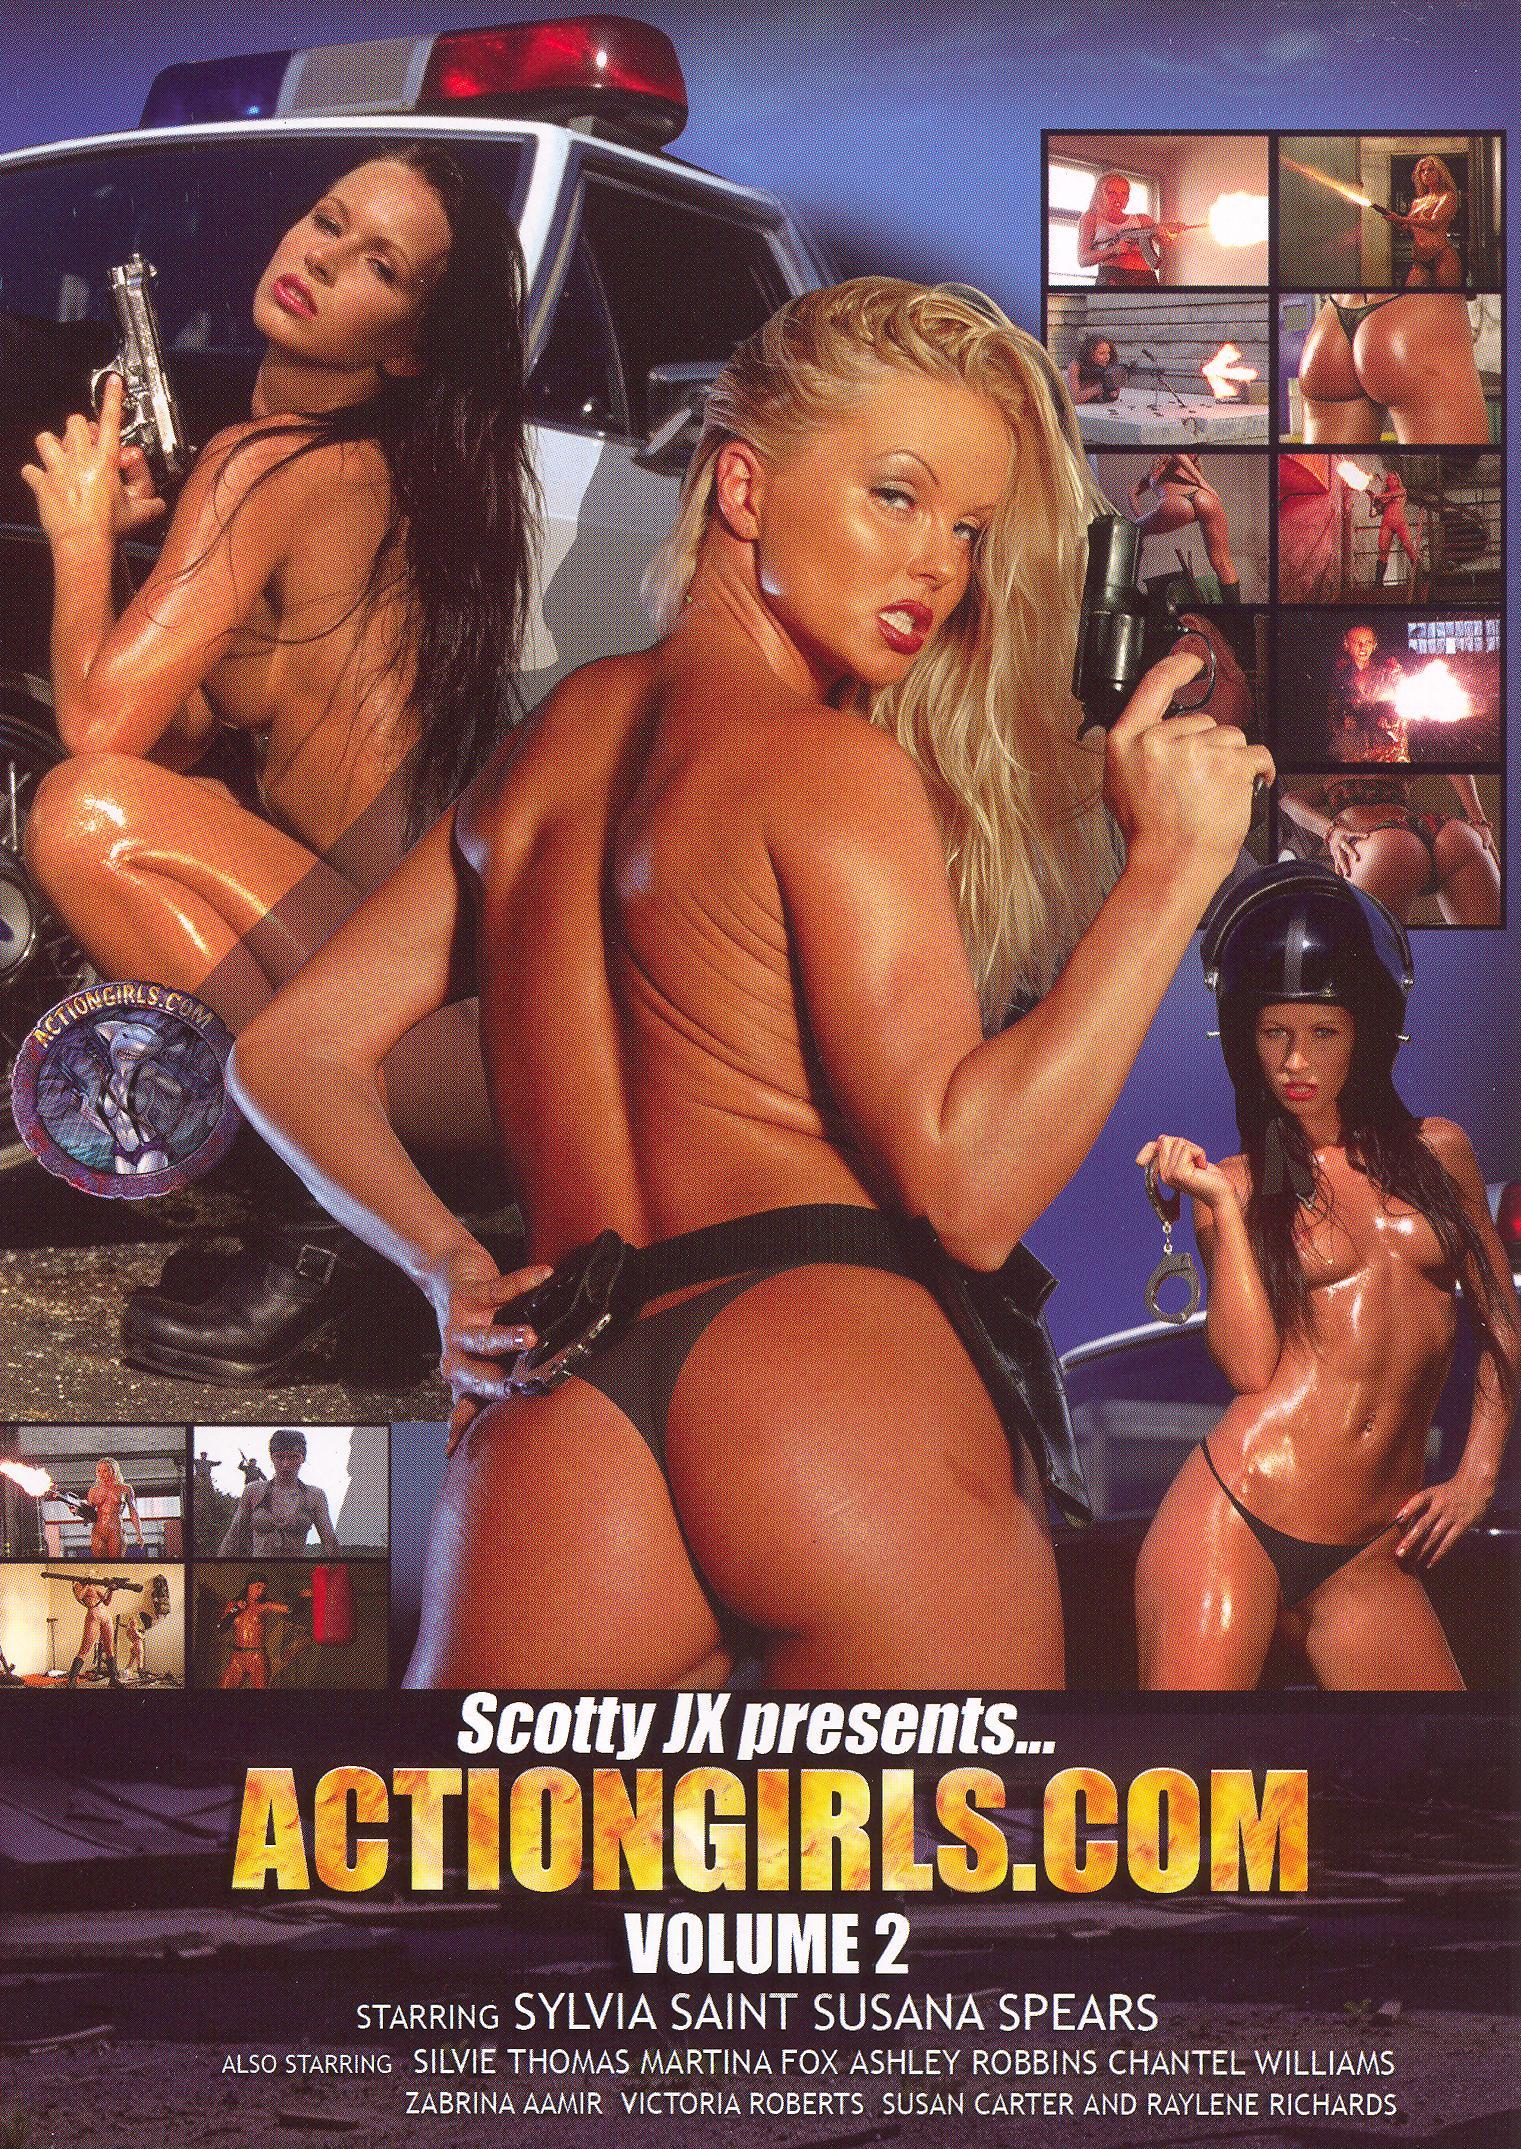 Actiongirls.com, Vol. 2